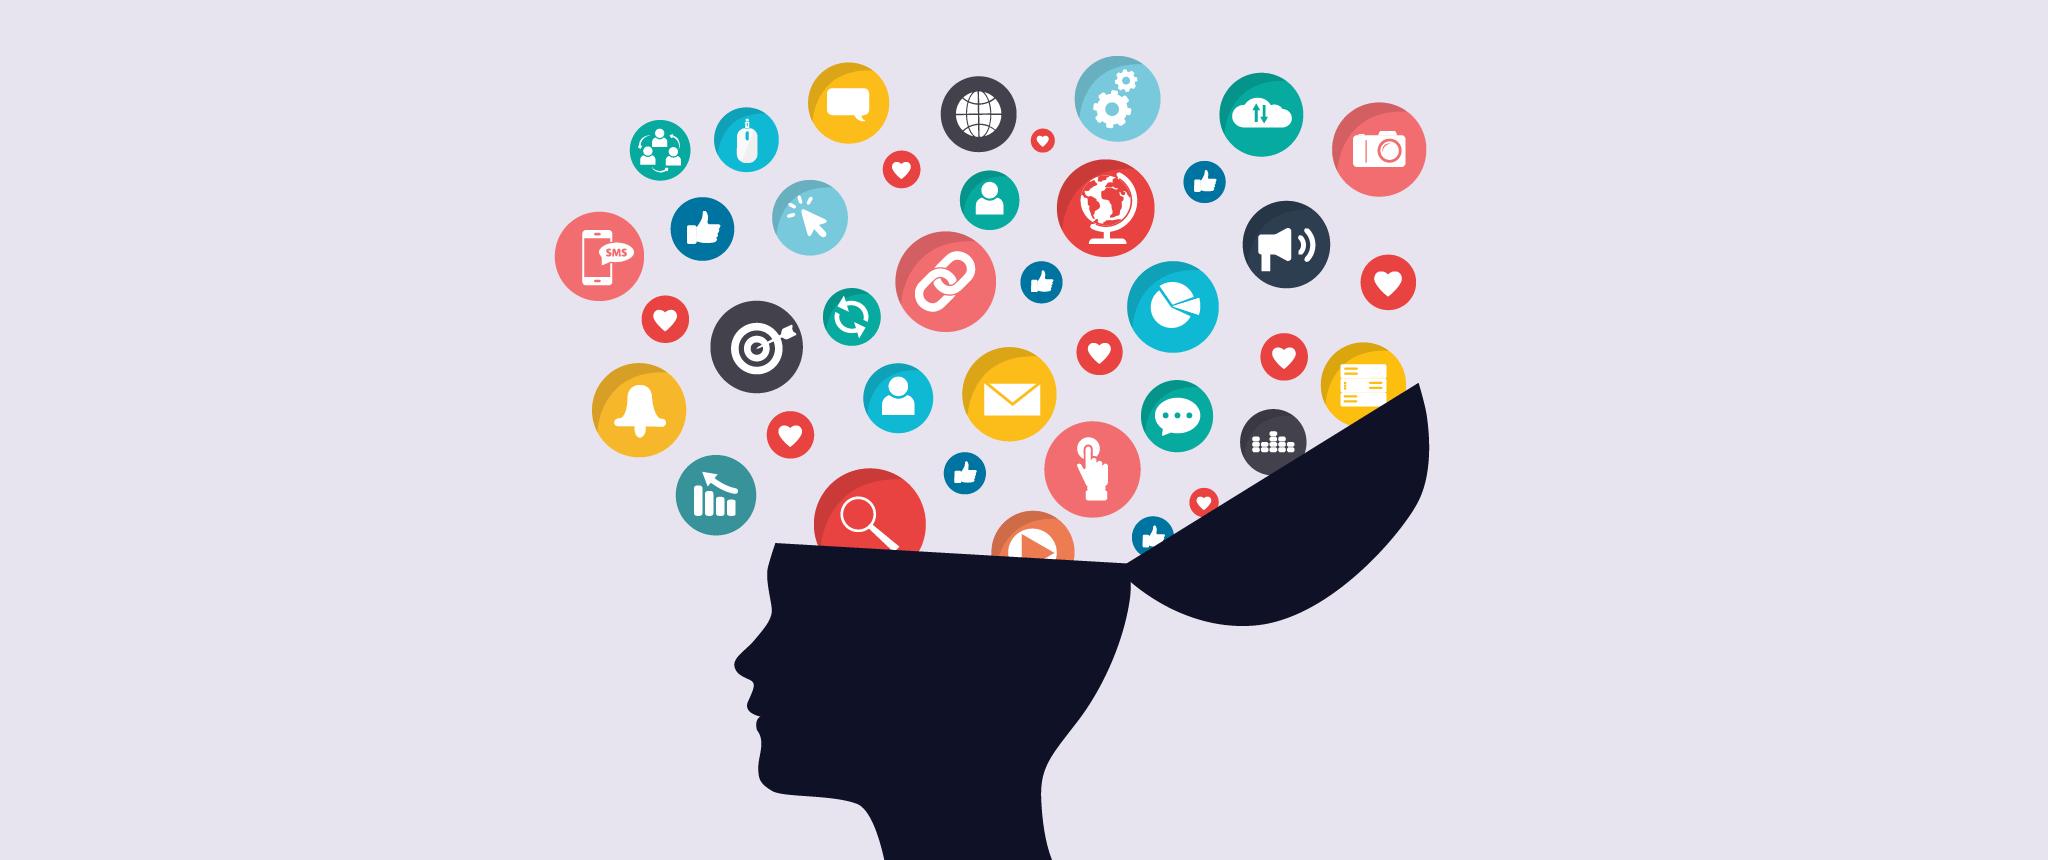 Using Marketing Psychology to Influence App Engagement